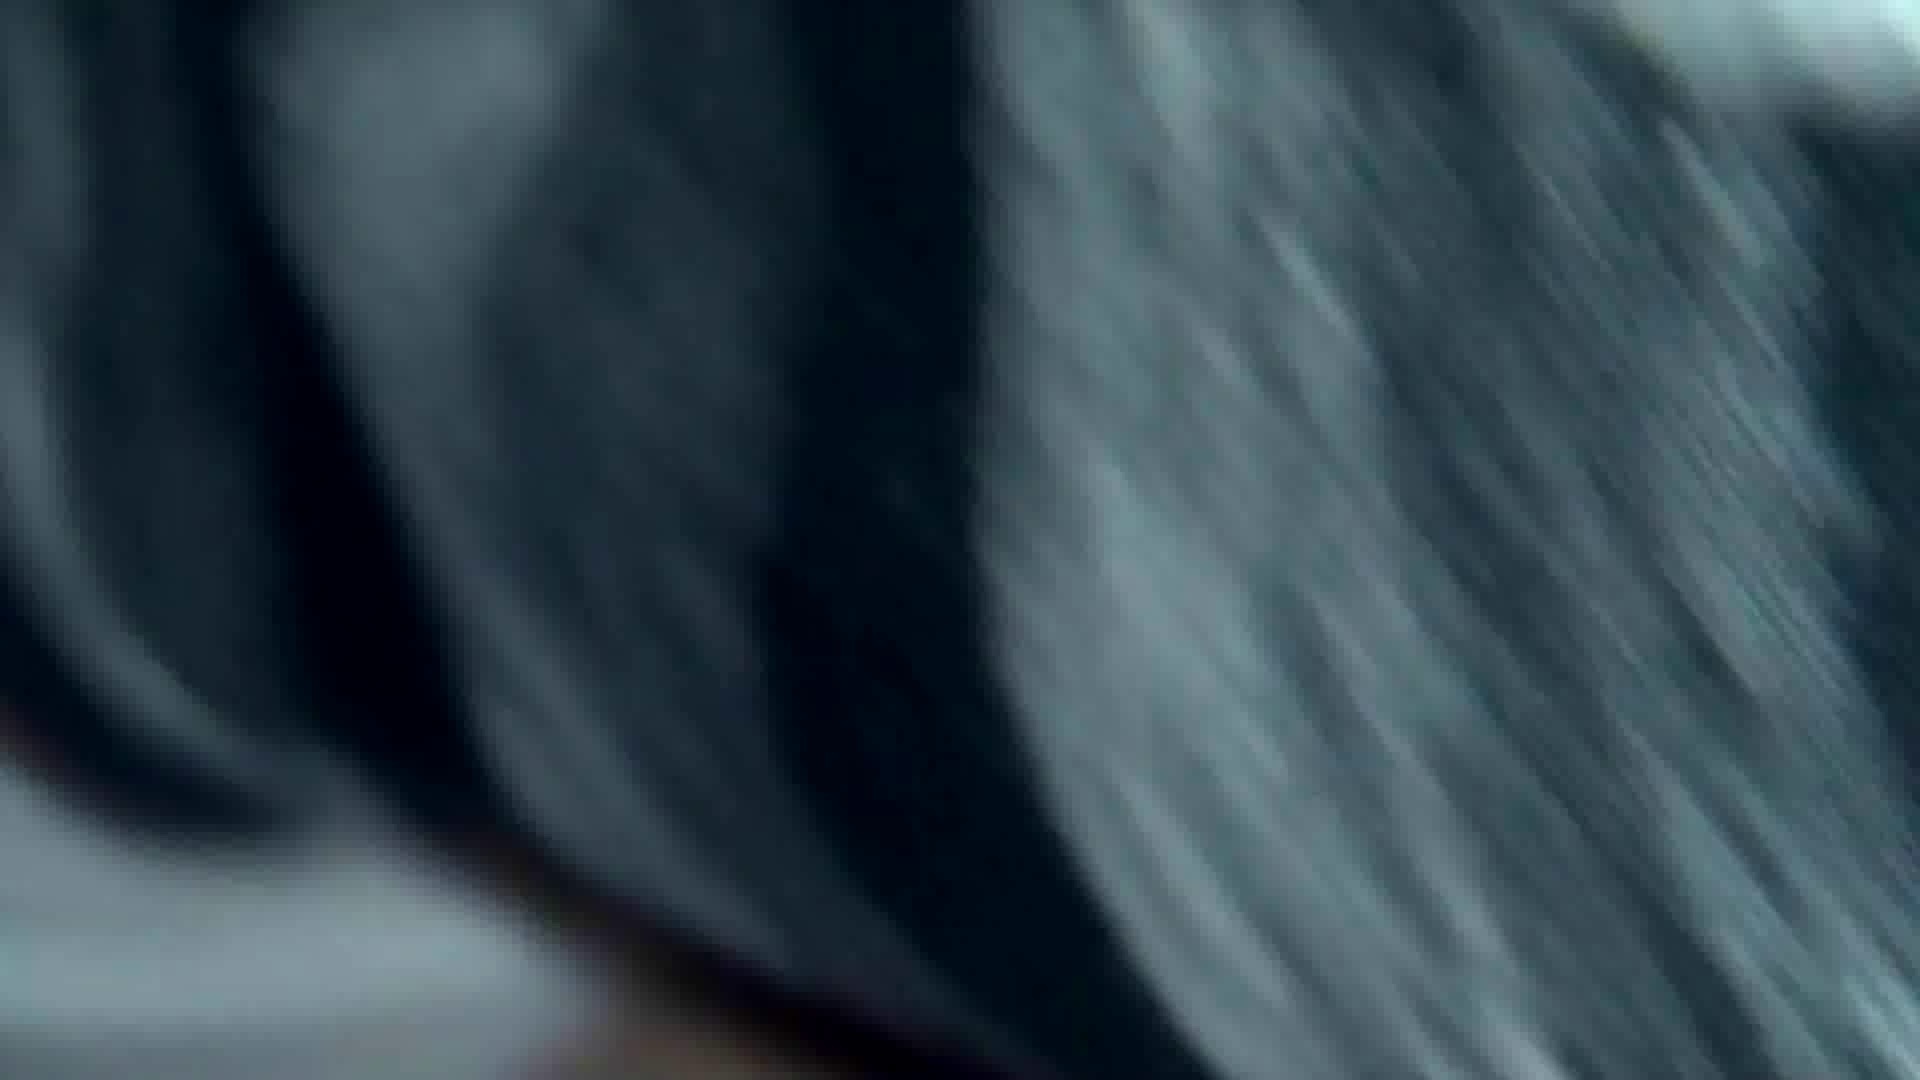 vol.34 【AIちゃん】 黒髪19歳 夏休みのプチ家出中 1回目 OLハメ撮り  22Pix 4